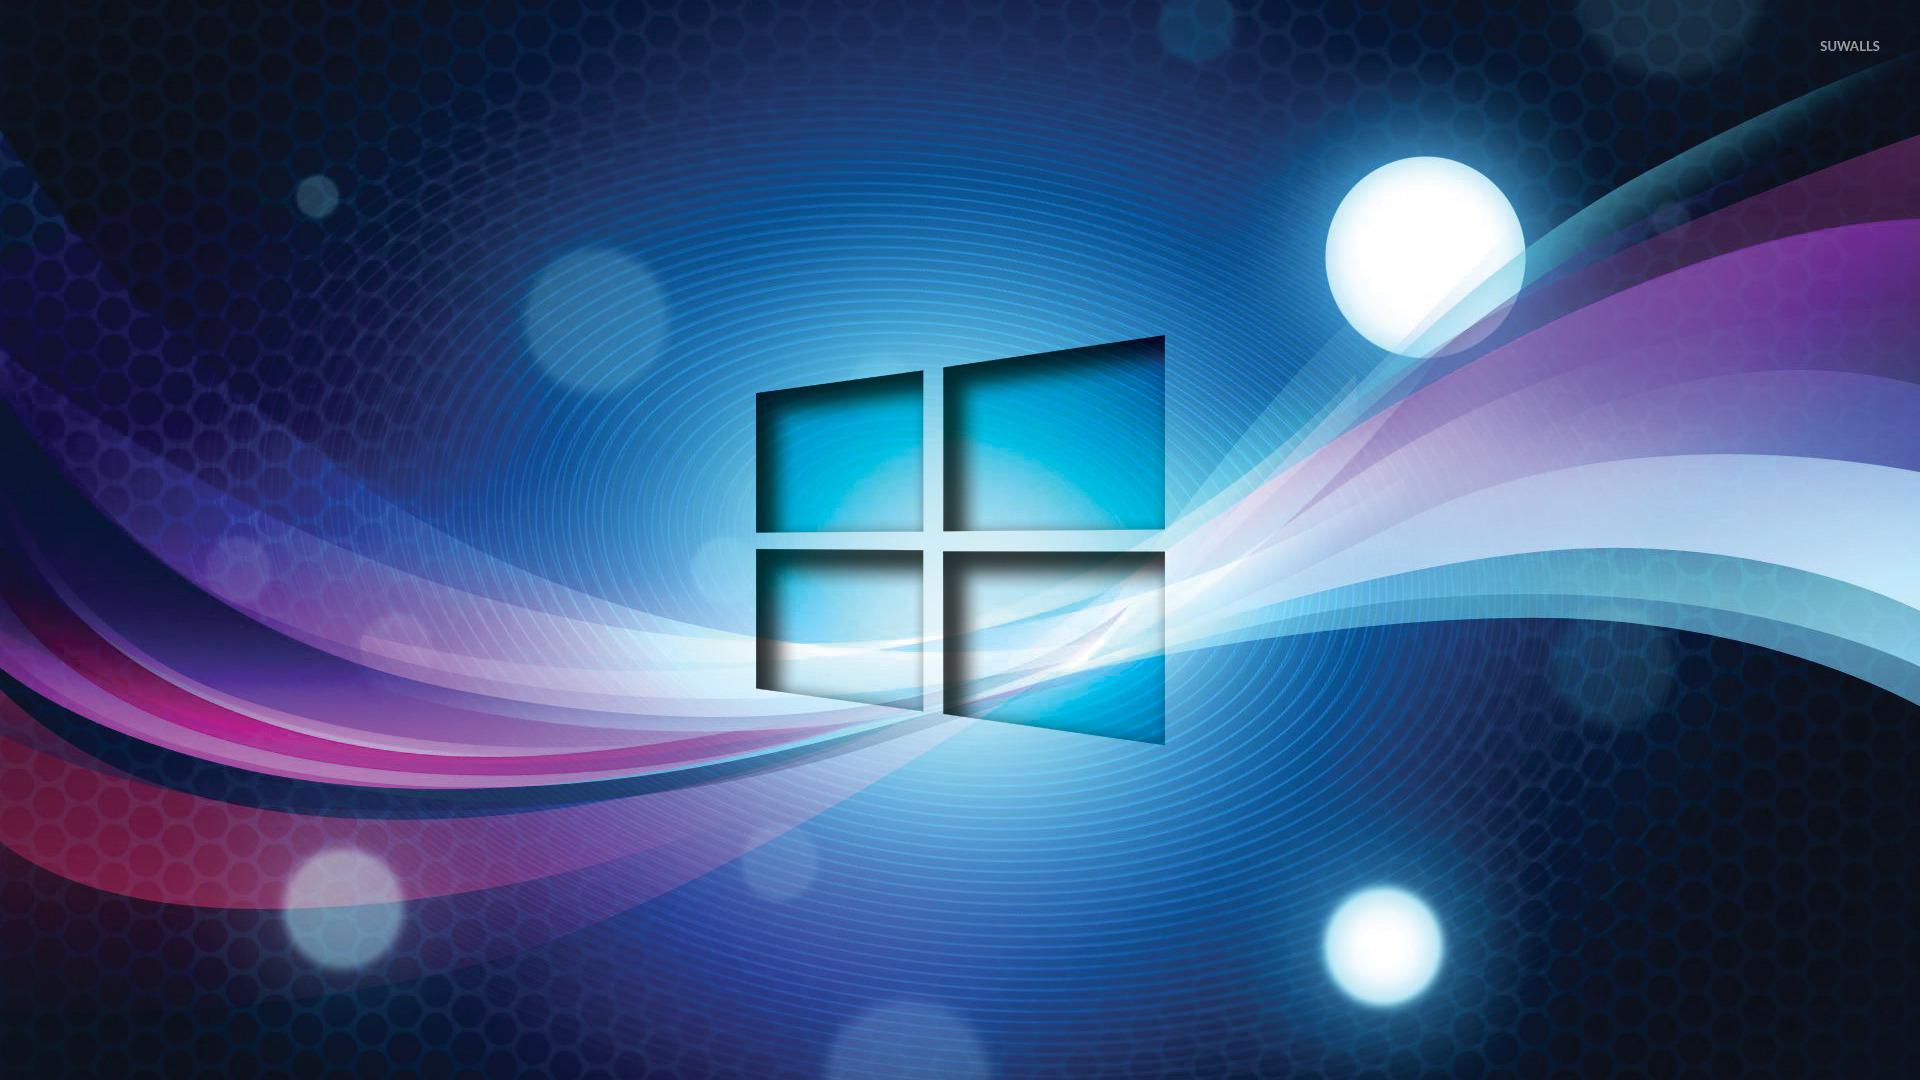 Free Windows 10 Wallpaper Puter Wallpapers